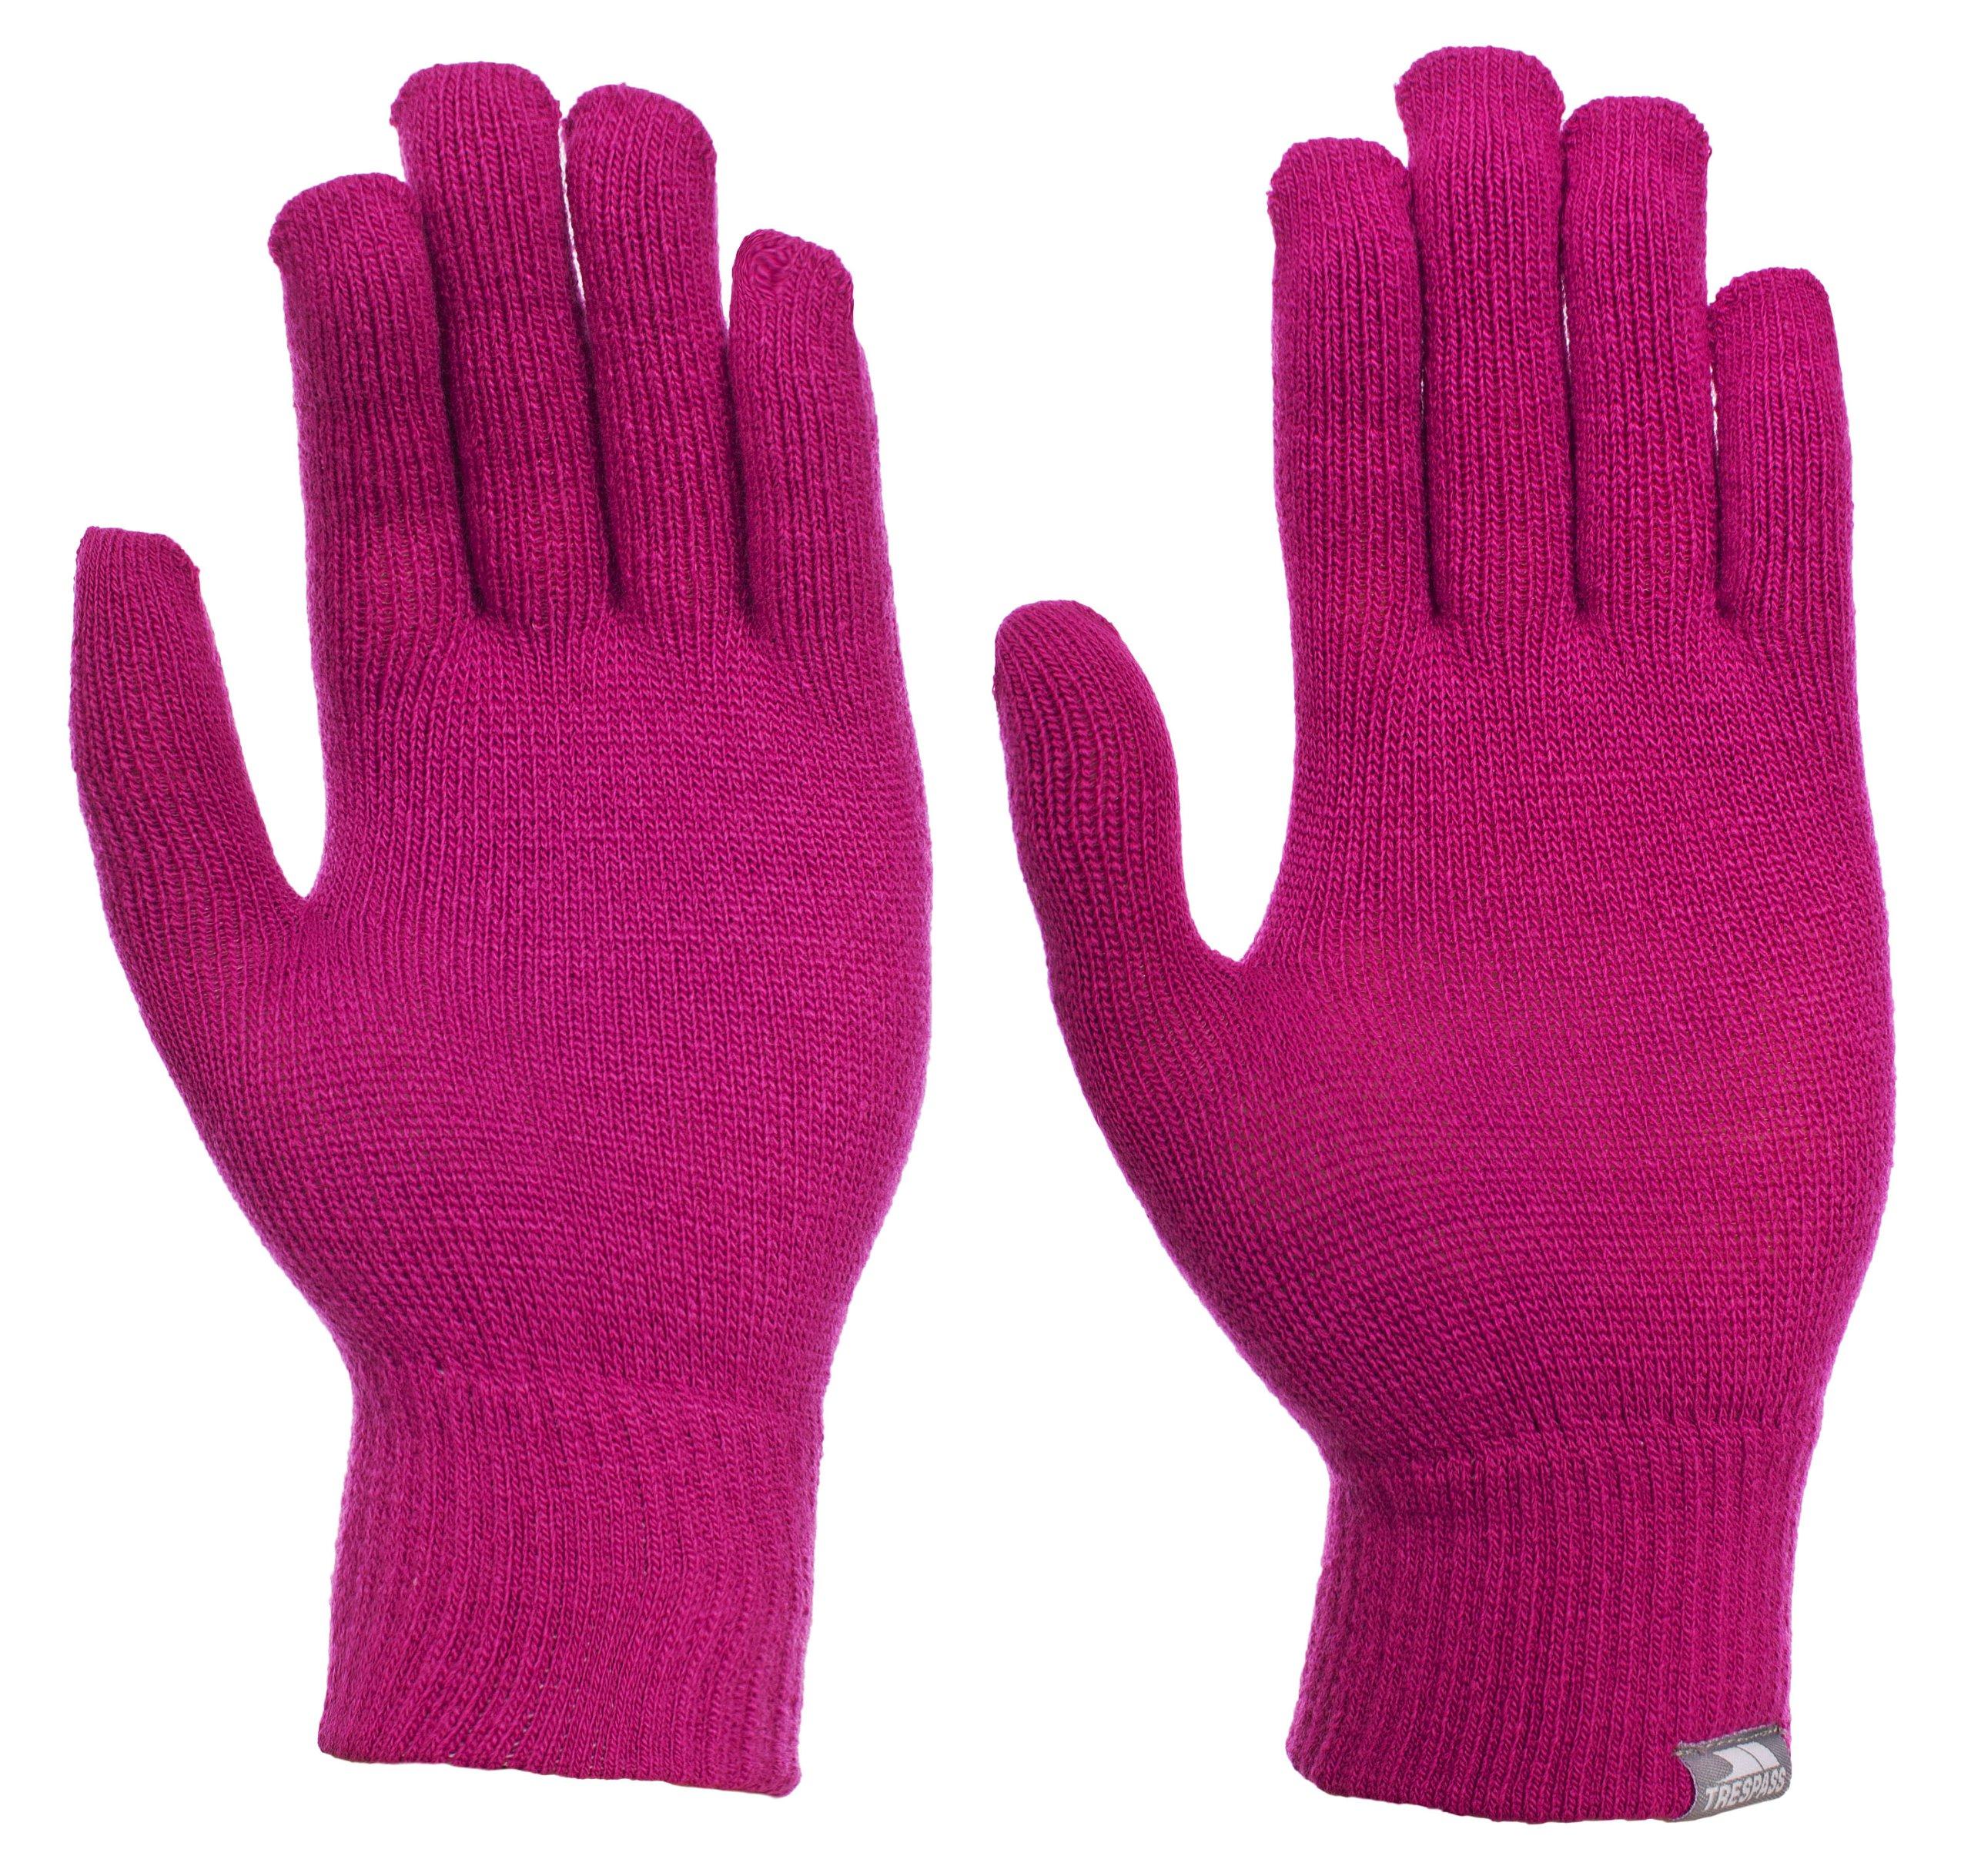 Trespass Kinder Presto Handschuh Rosa Pansy Each